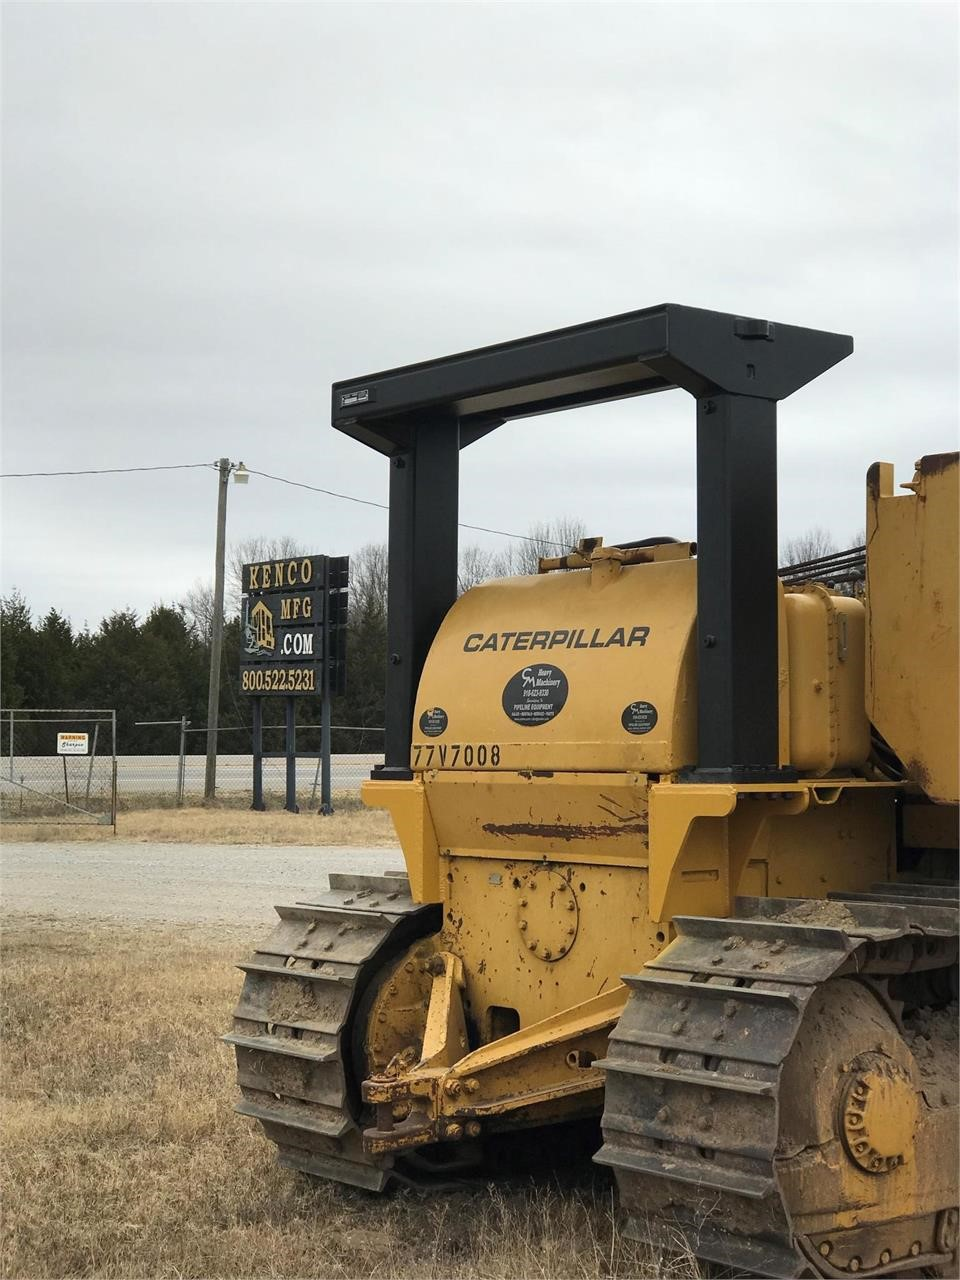 KENCO For Sale in Atoka, Oklahoma | LiftsToday com